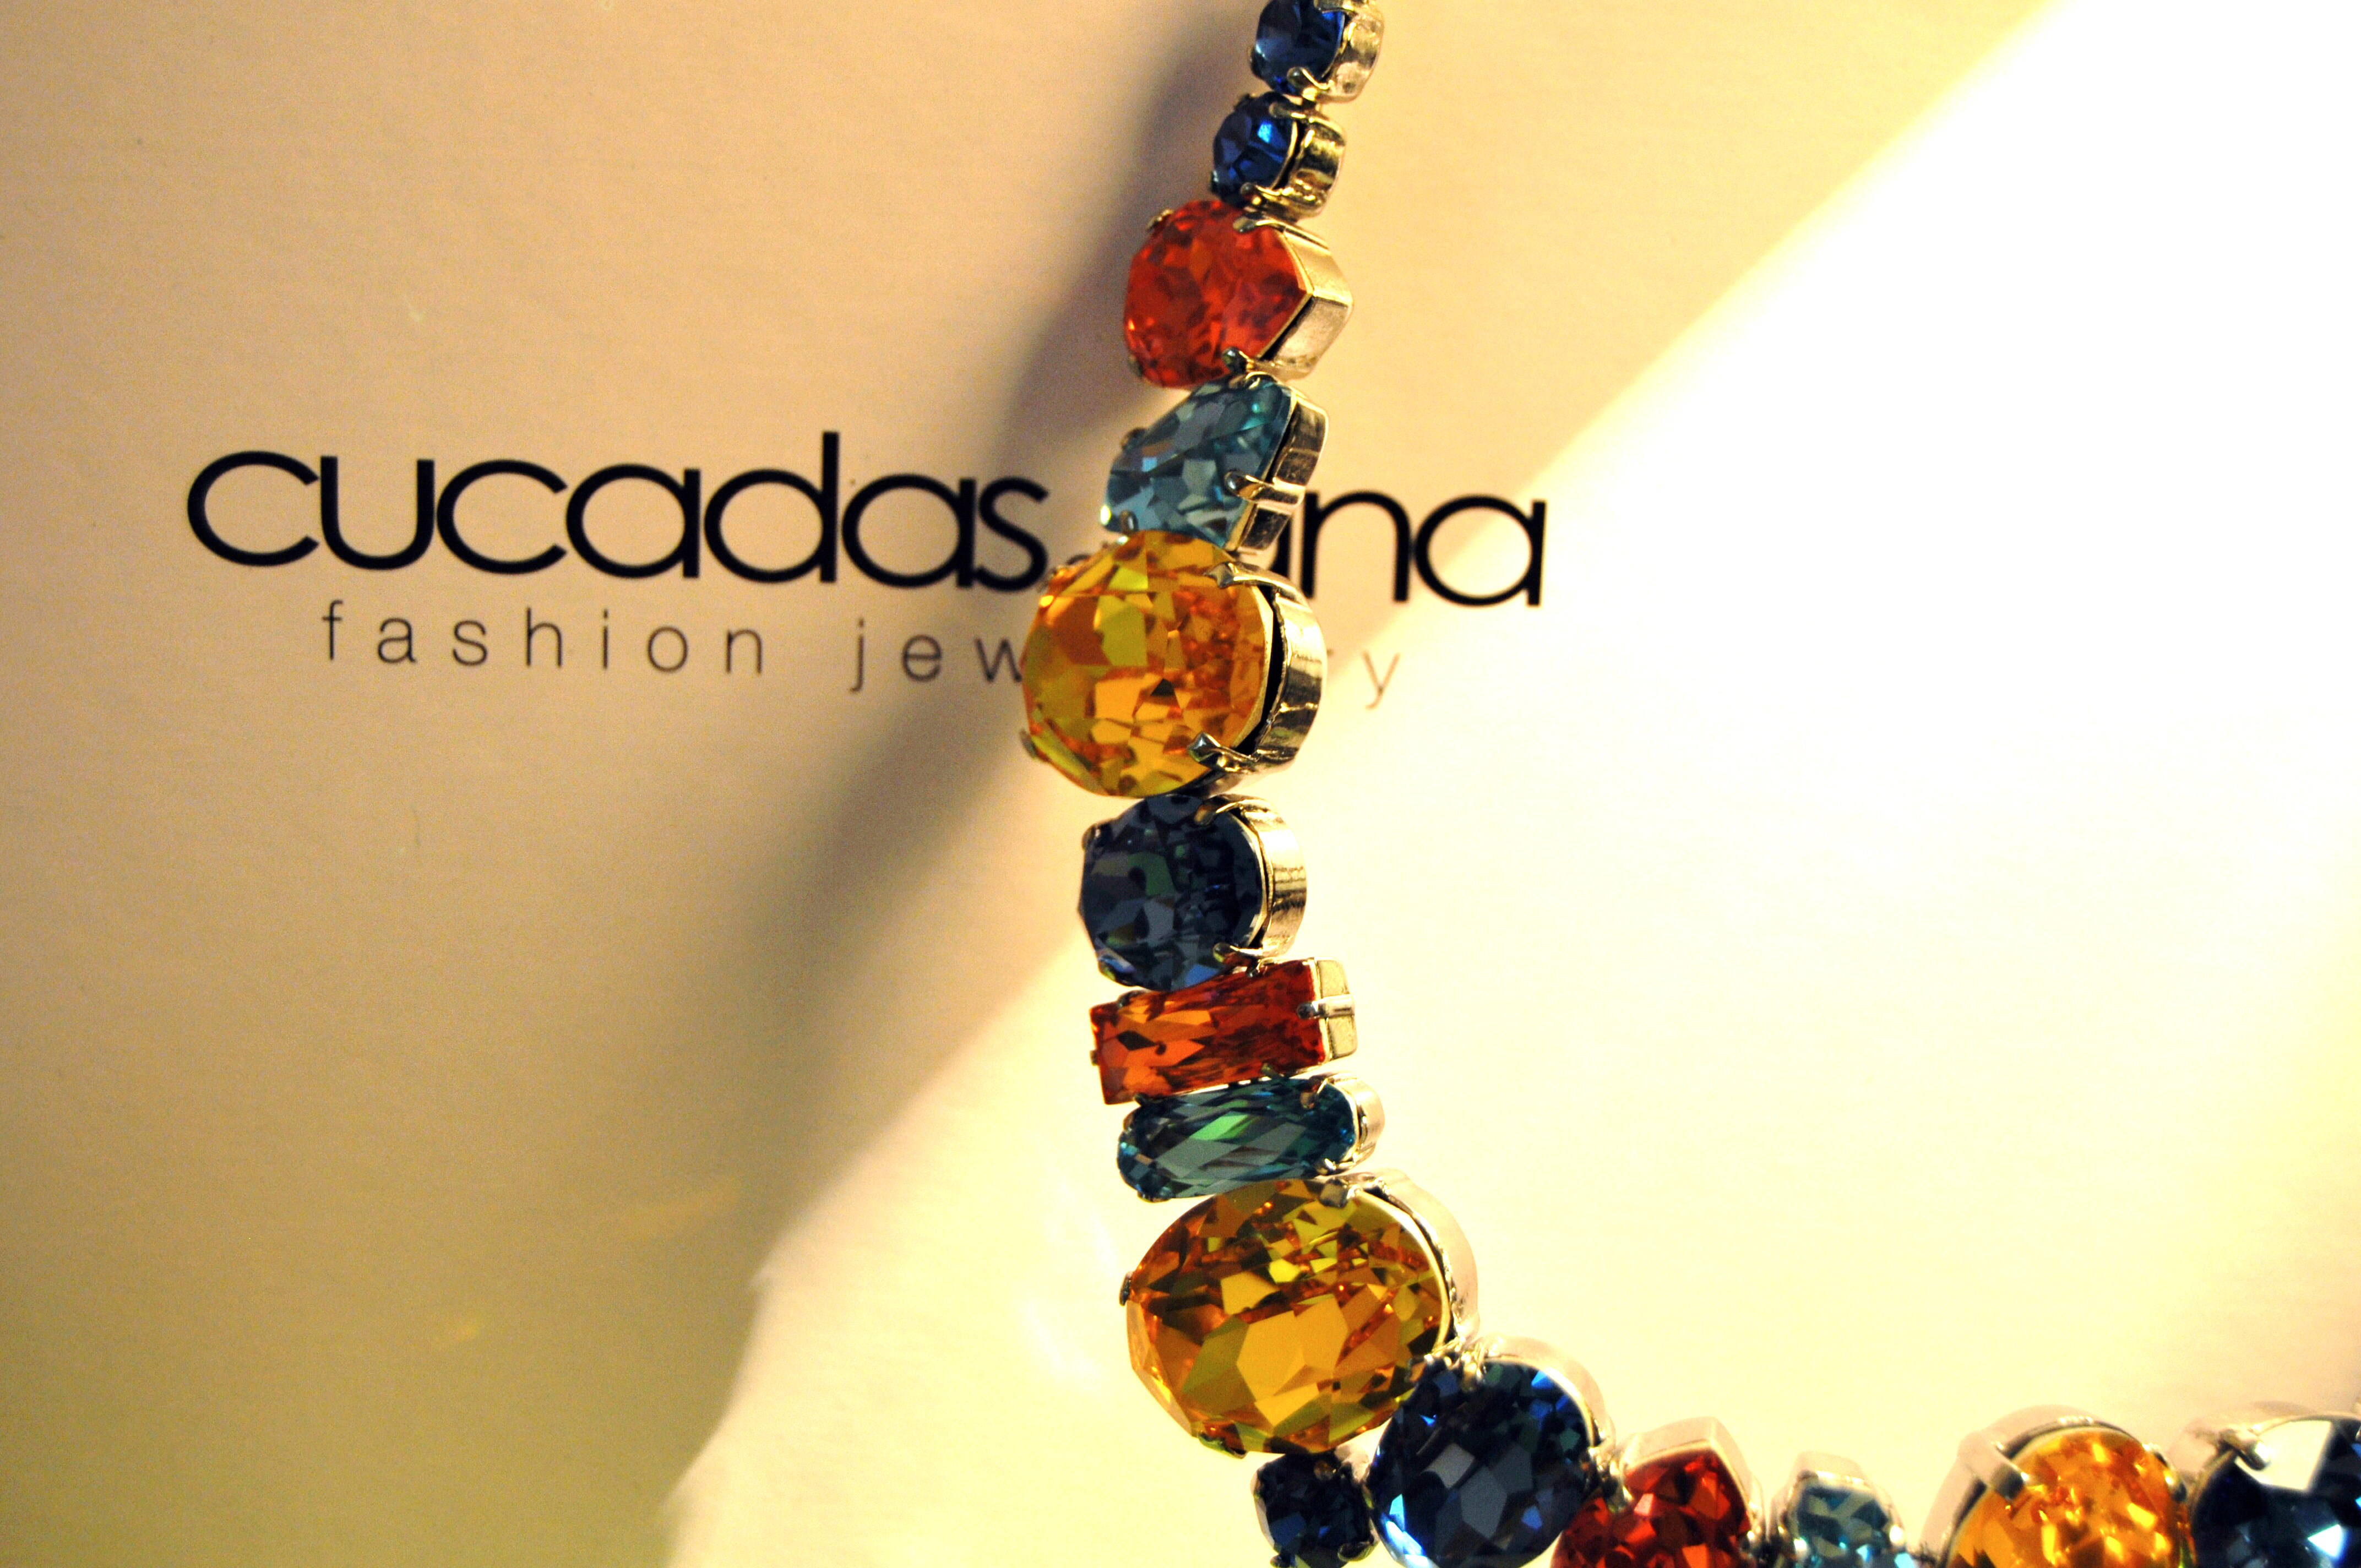 Cucadas de Ana Jewelry Symbol Wallpaper